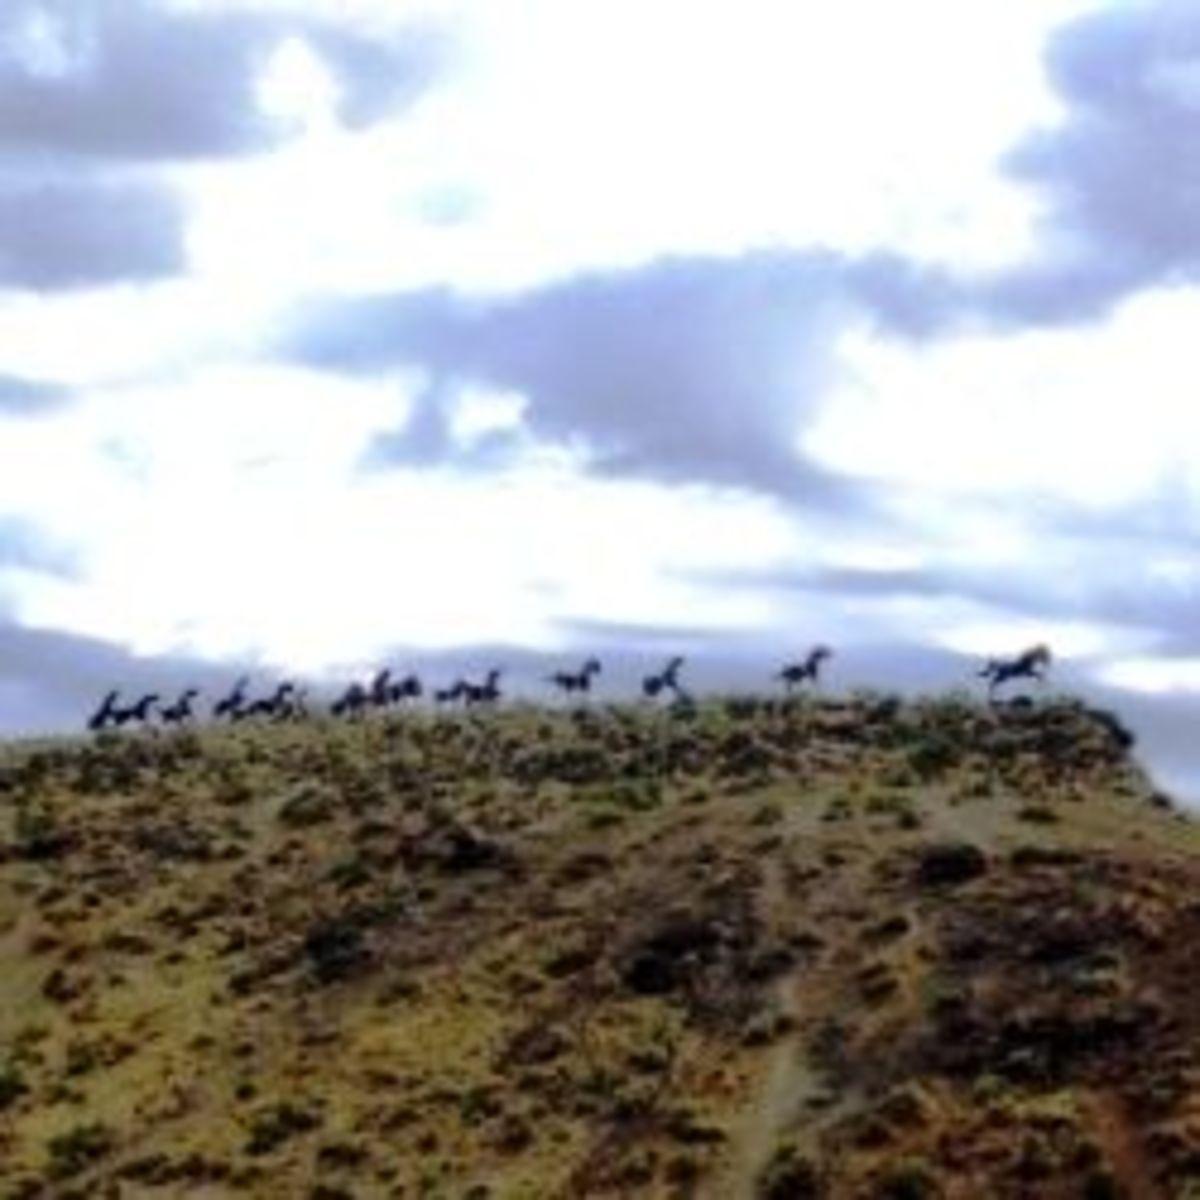 Wild Horses Monument in Washington State